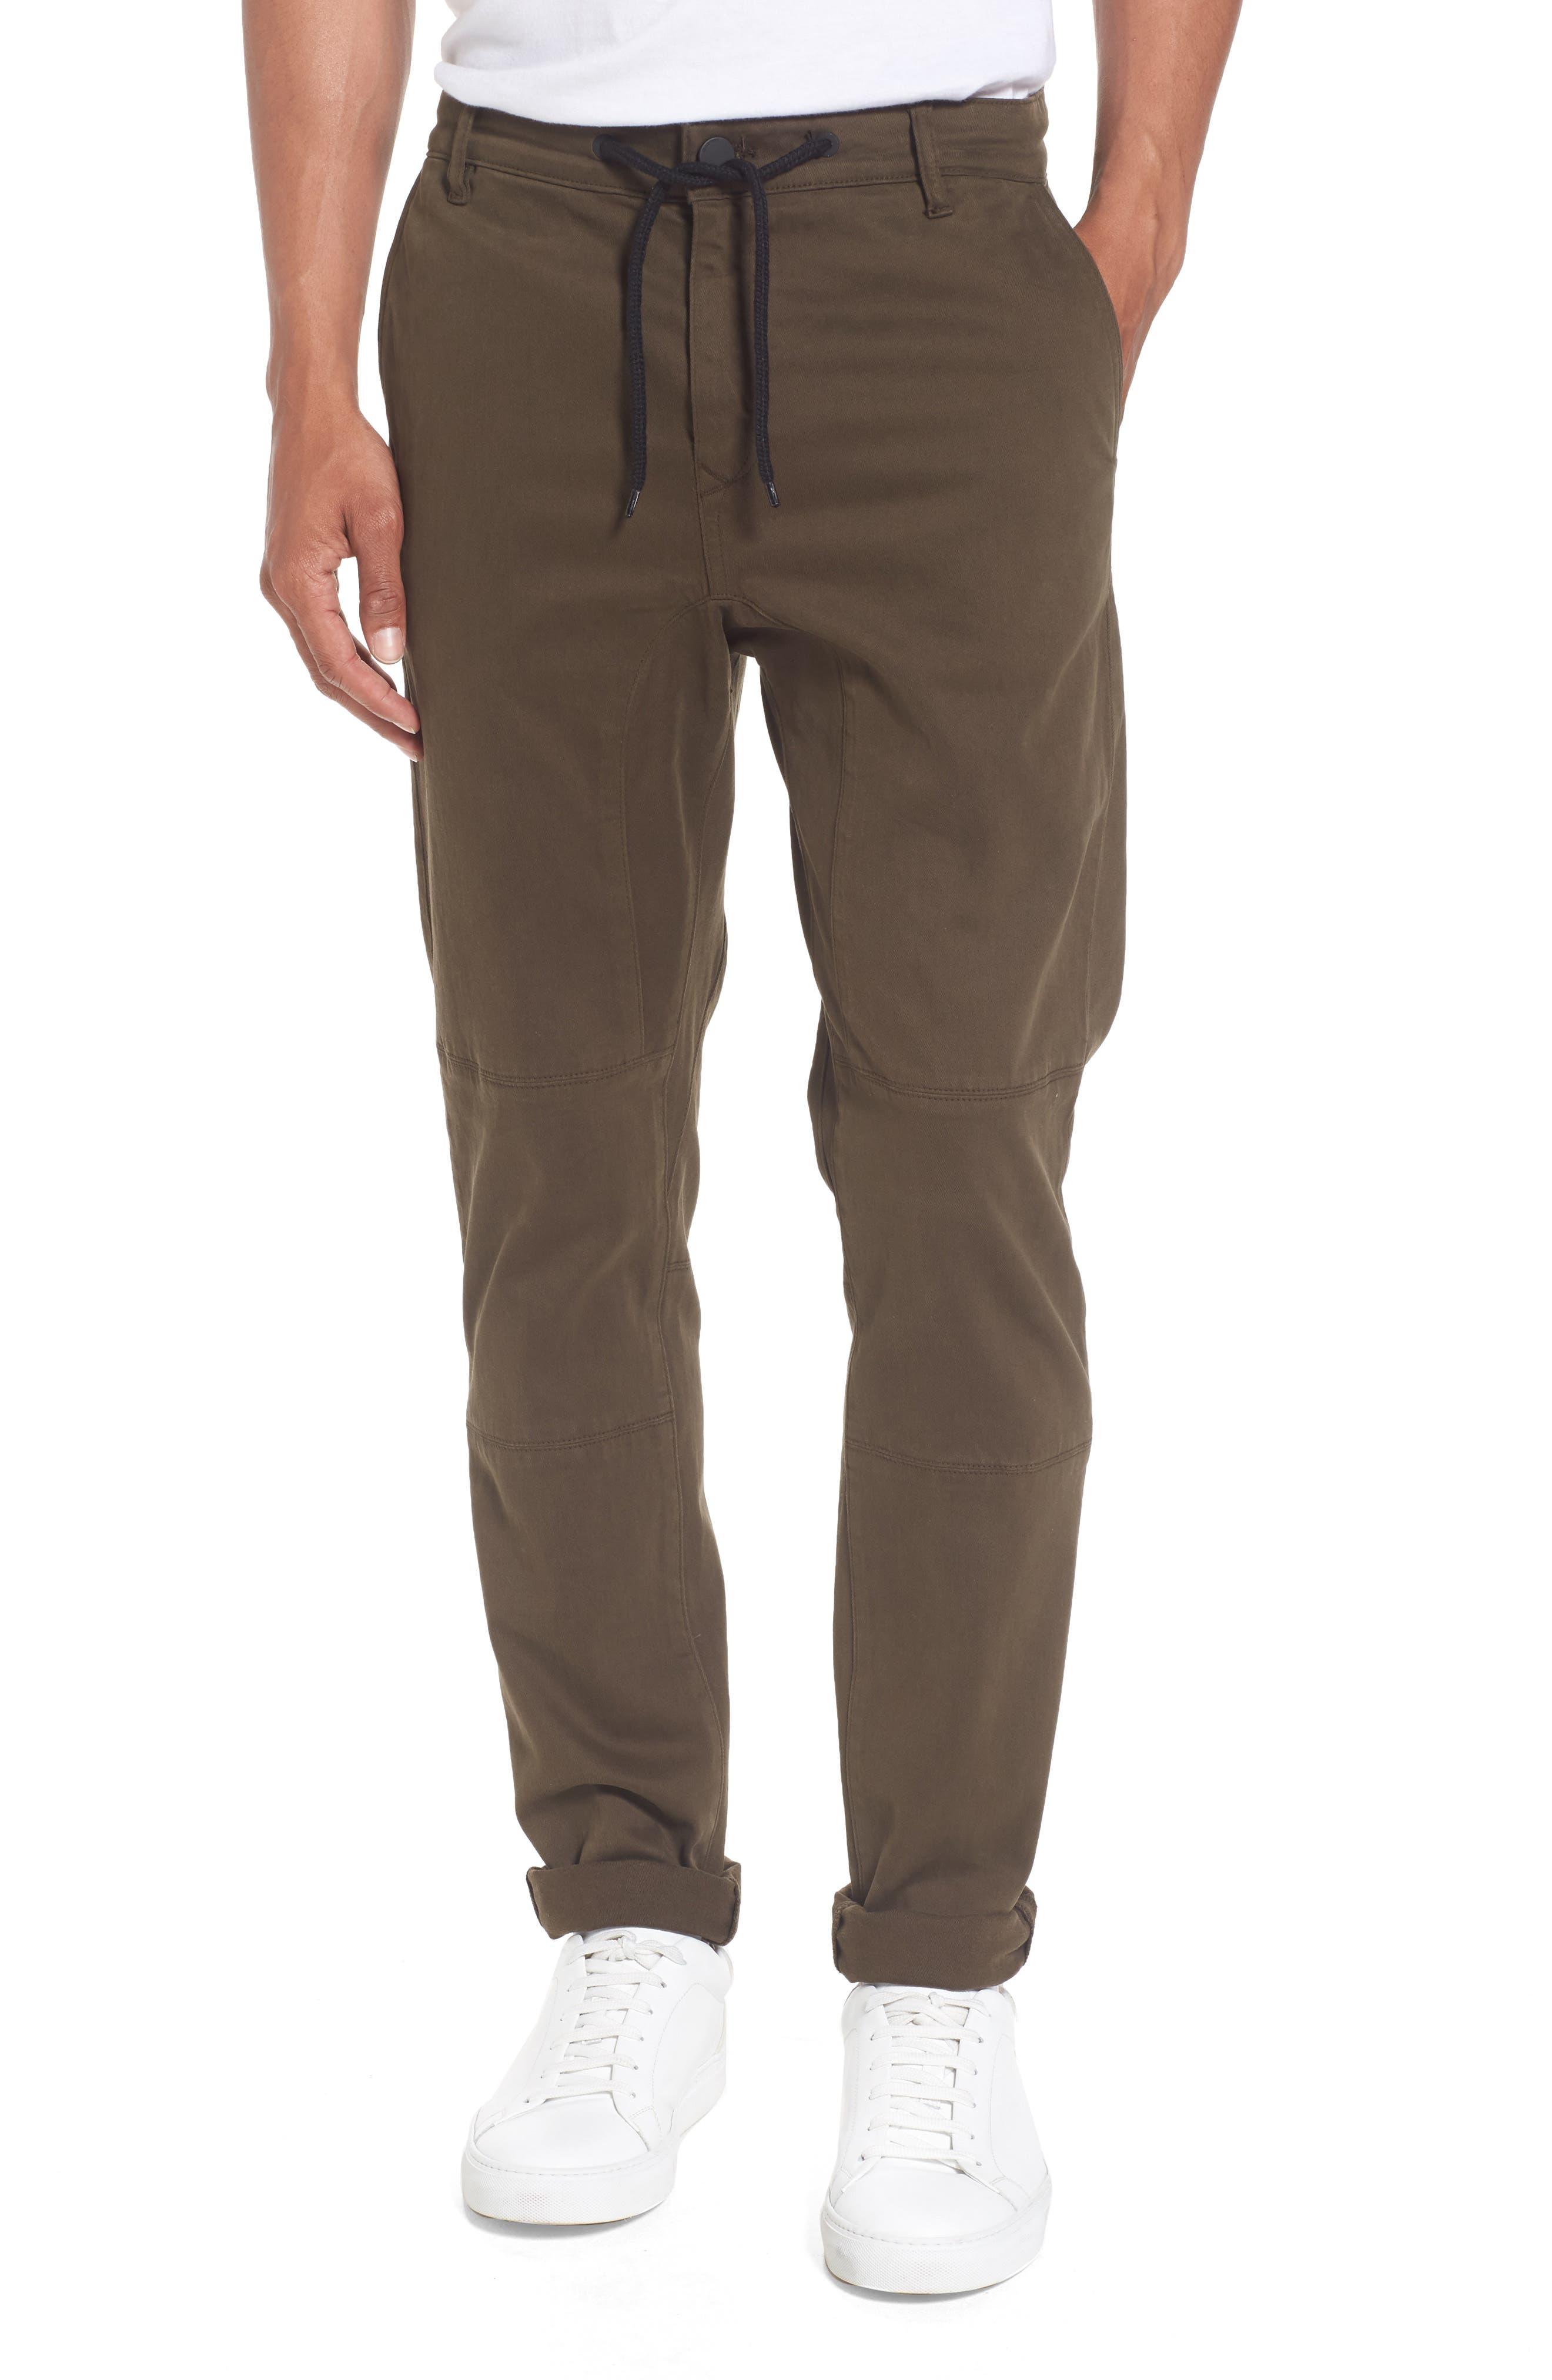 DL1961 Jay Slim Skinny Fit Jogger Pants